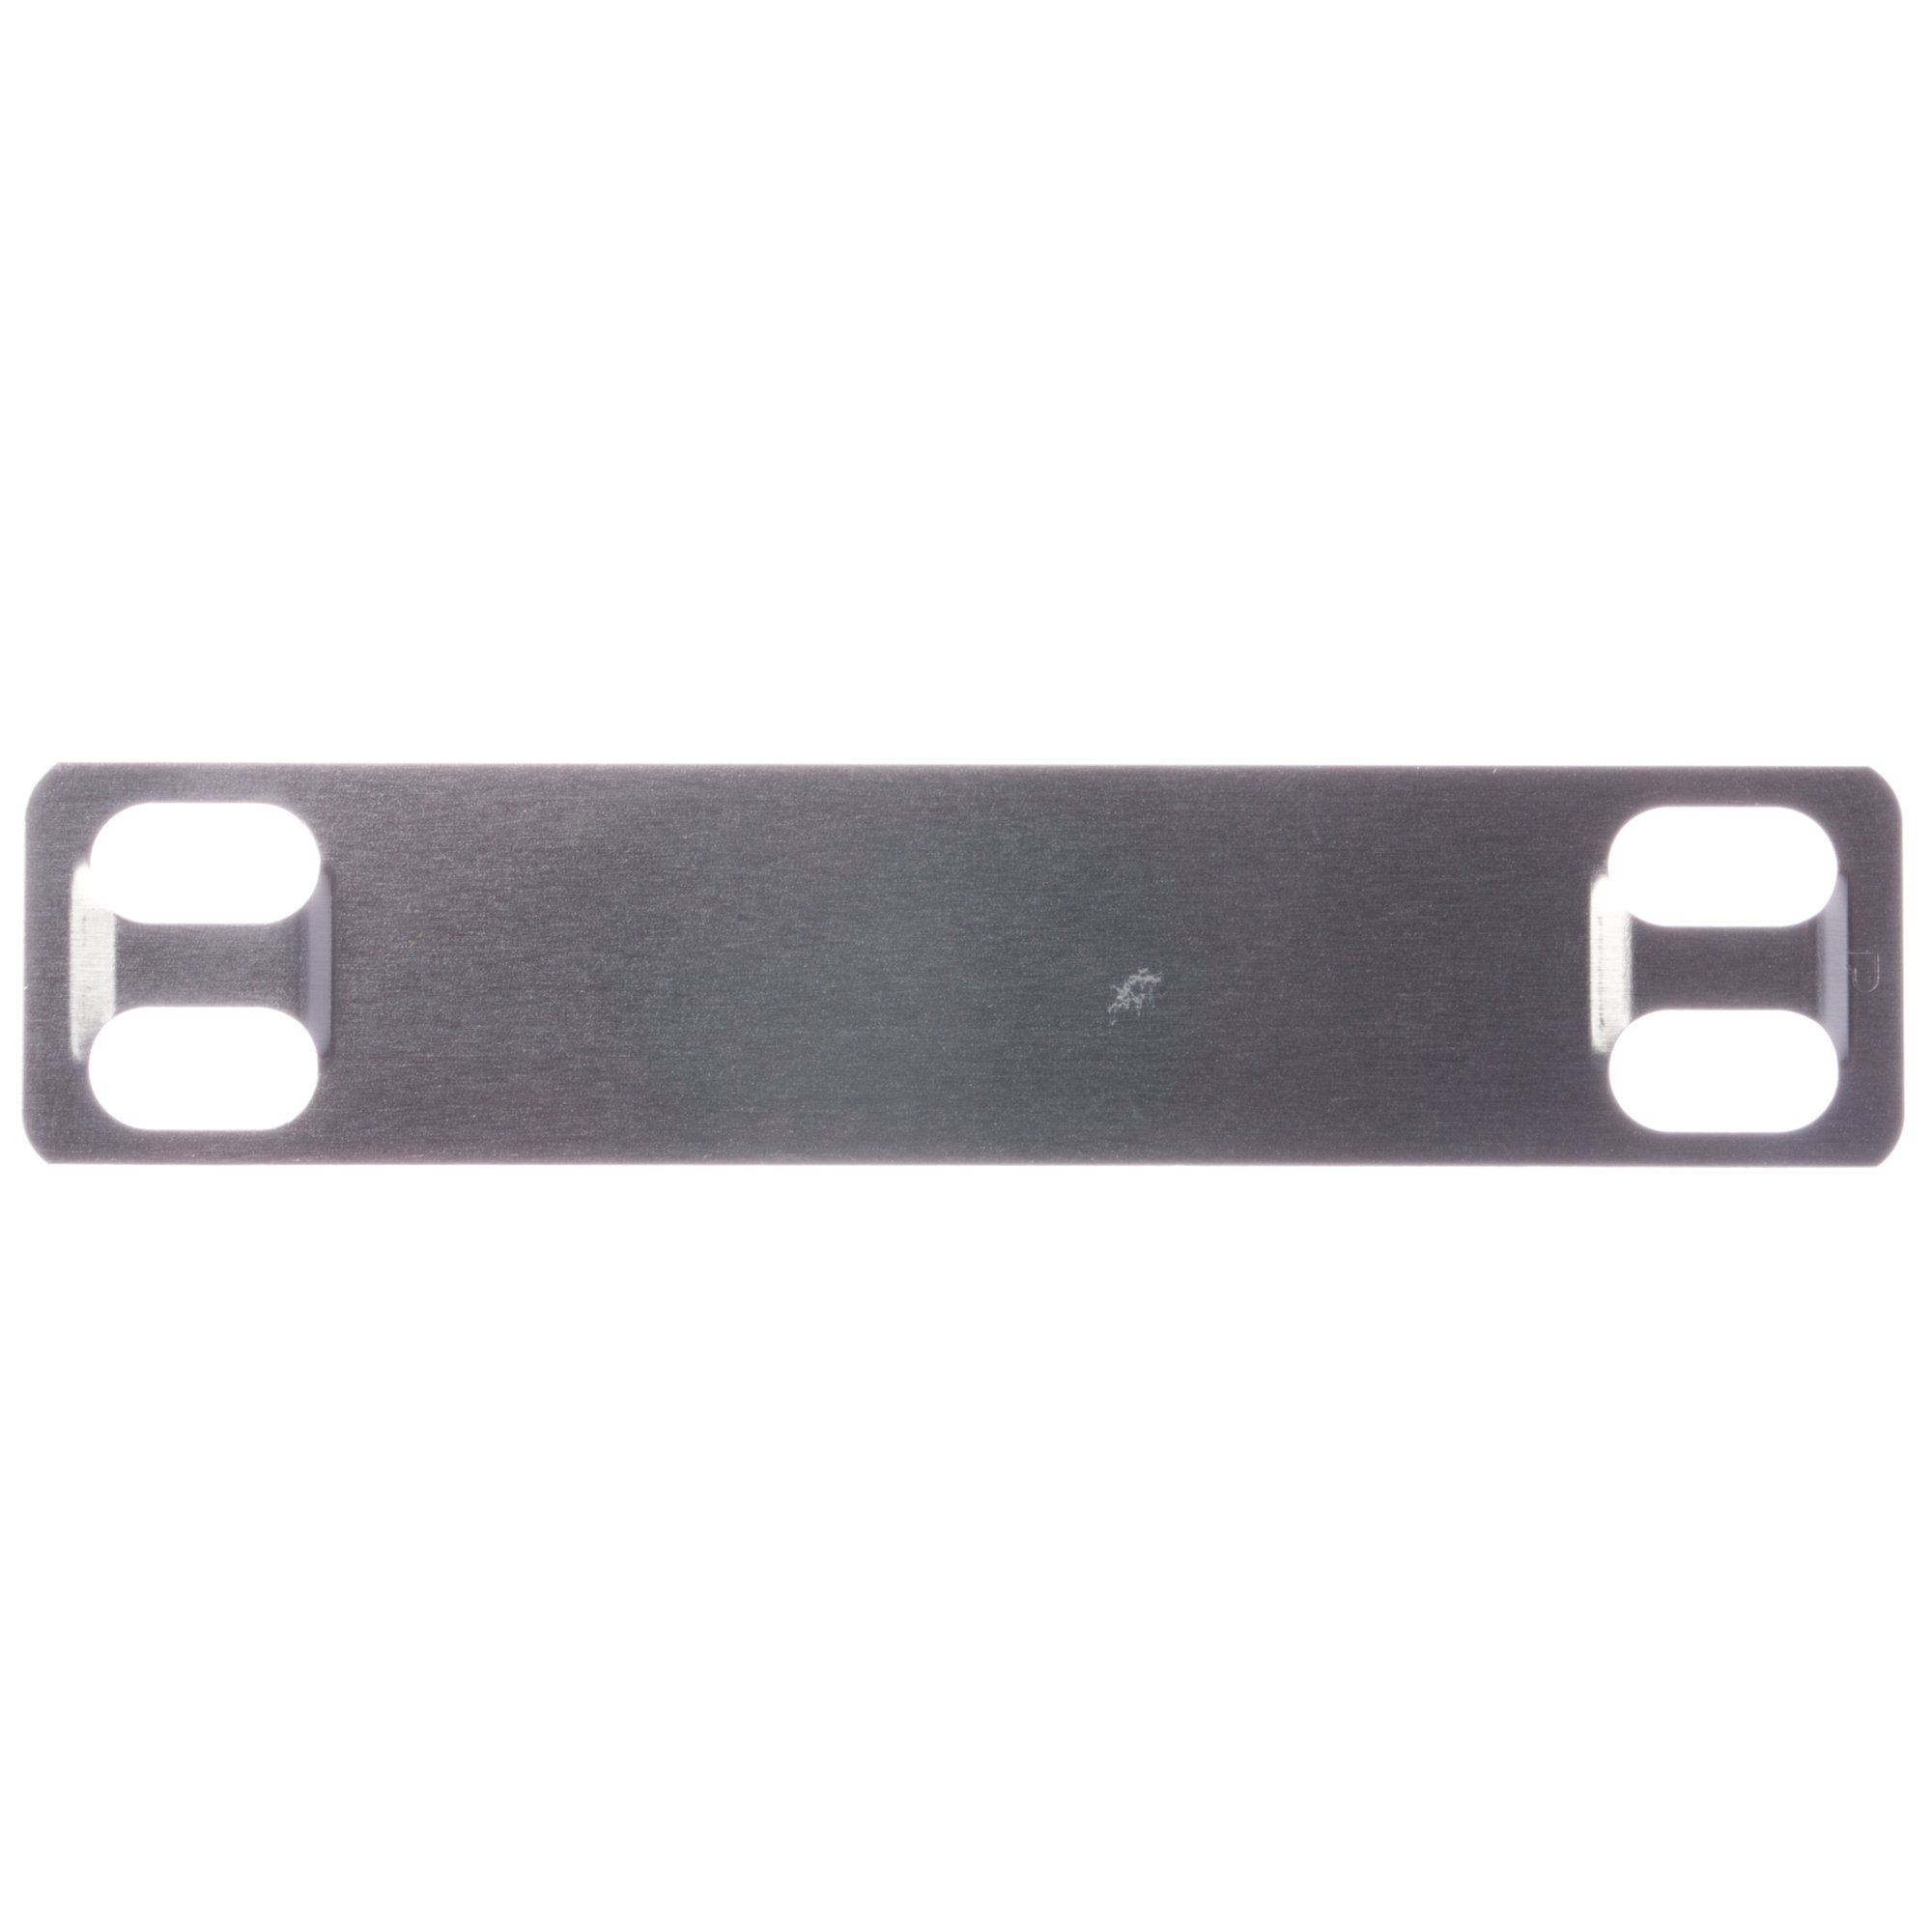 Panduit MMP350H-CAL Marker Plate, Aluminum, Natural (100-Pack)